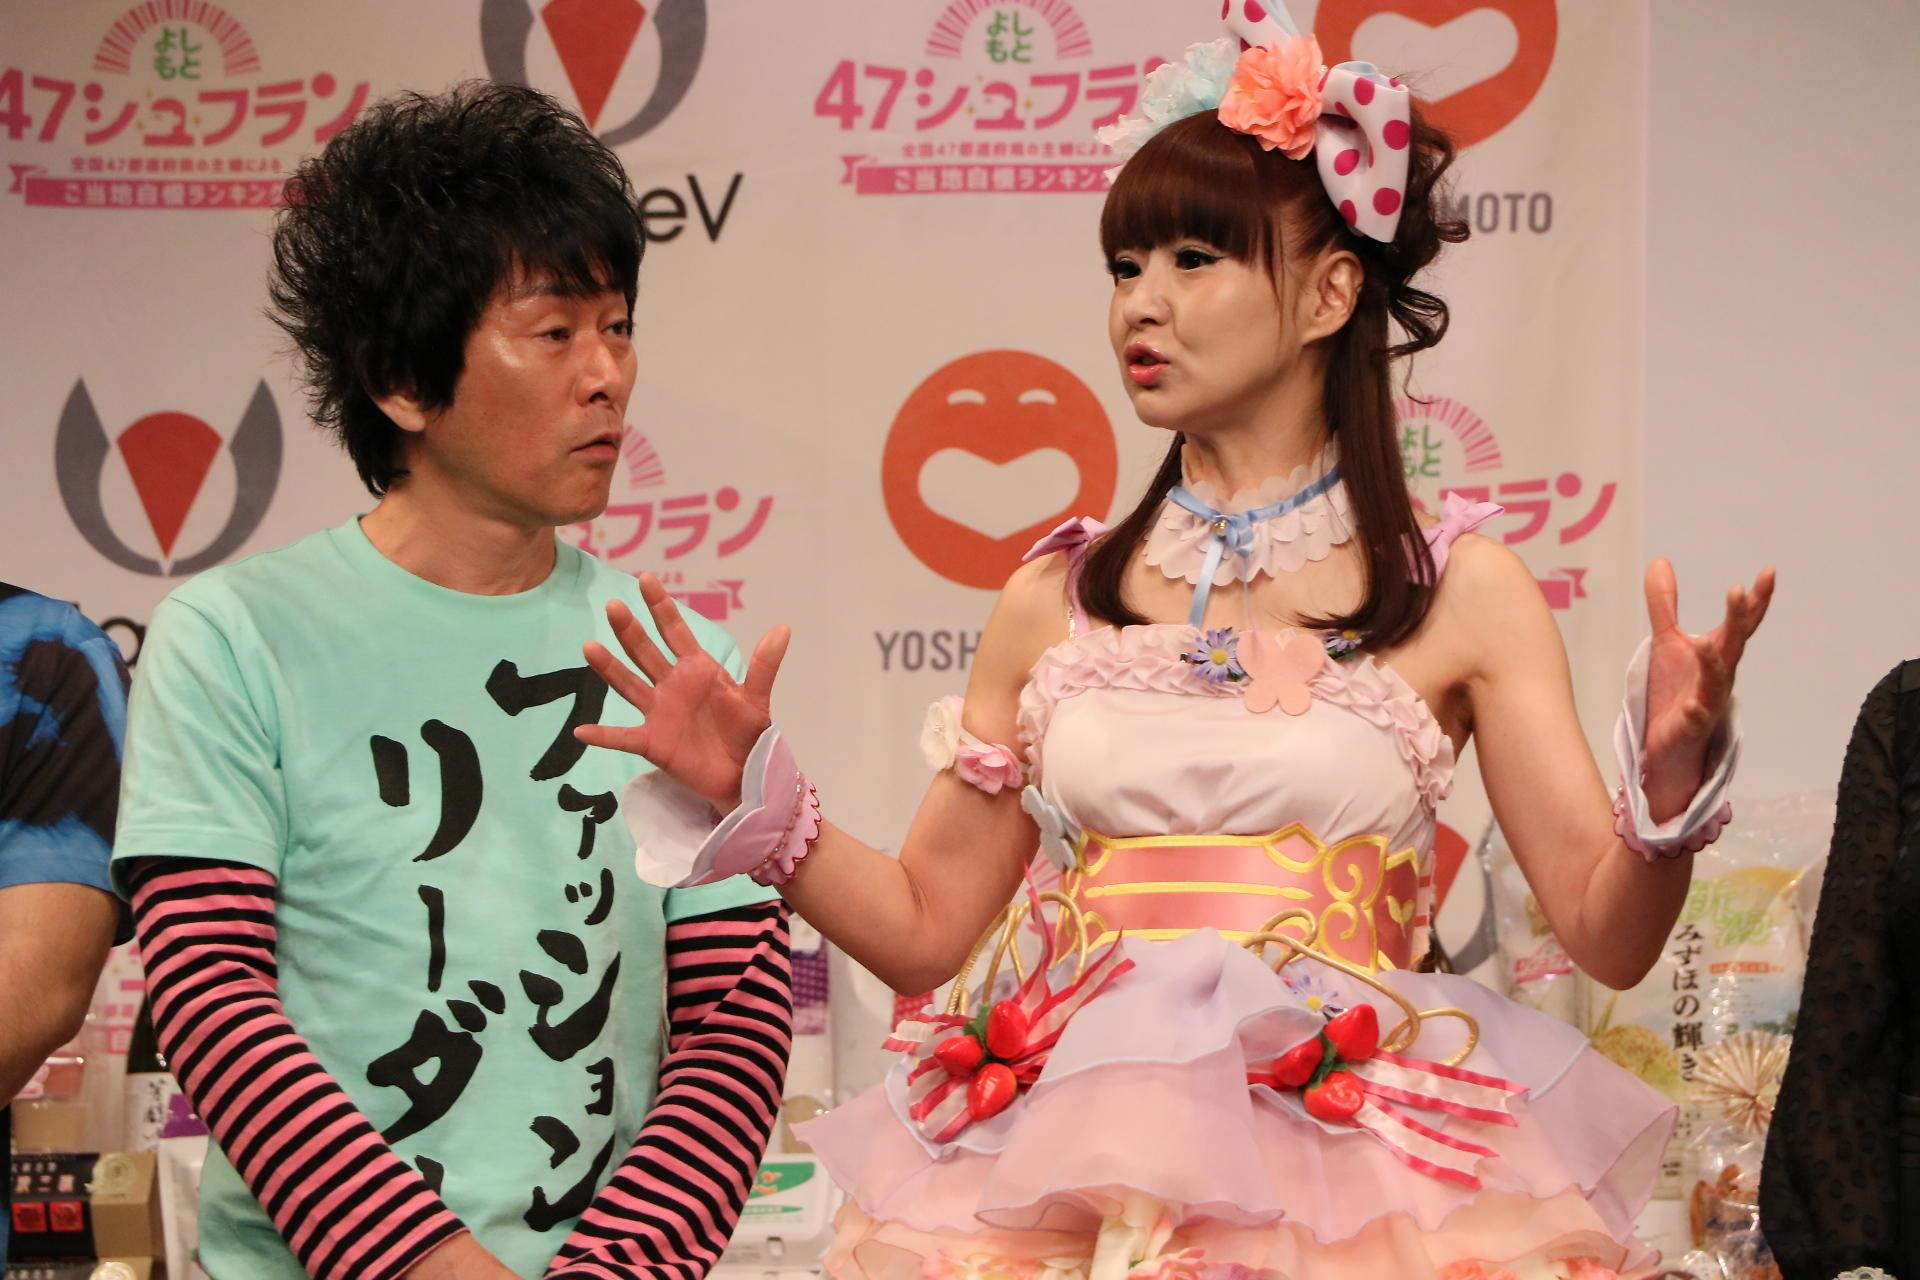 http://news.yoshimoto.co.jp/20180313171528-0b299f50fb9f25abcafe67e5d63fa53e69f5a40e.jpg